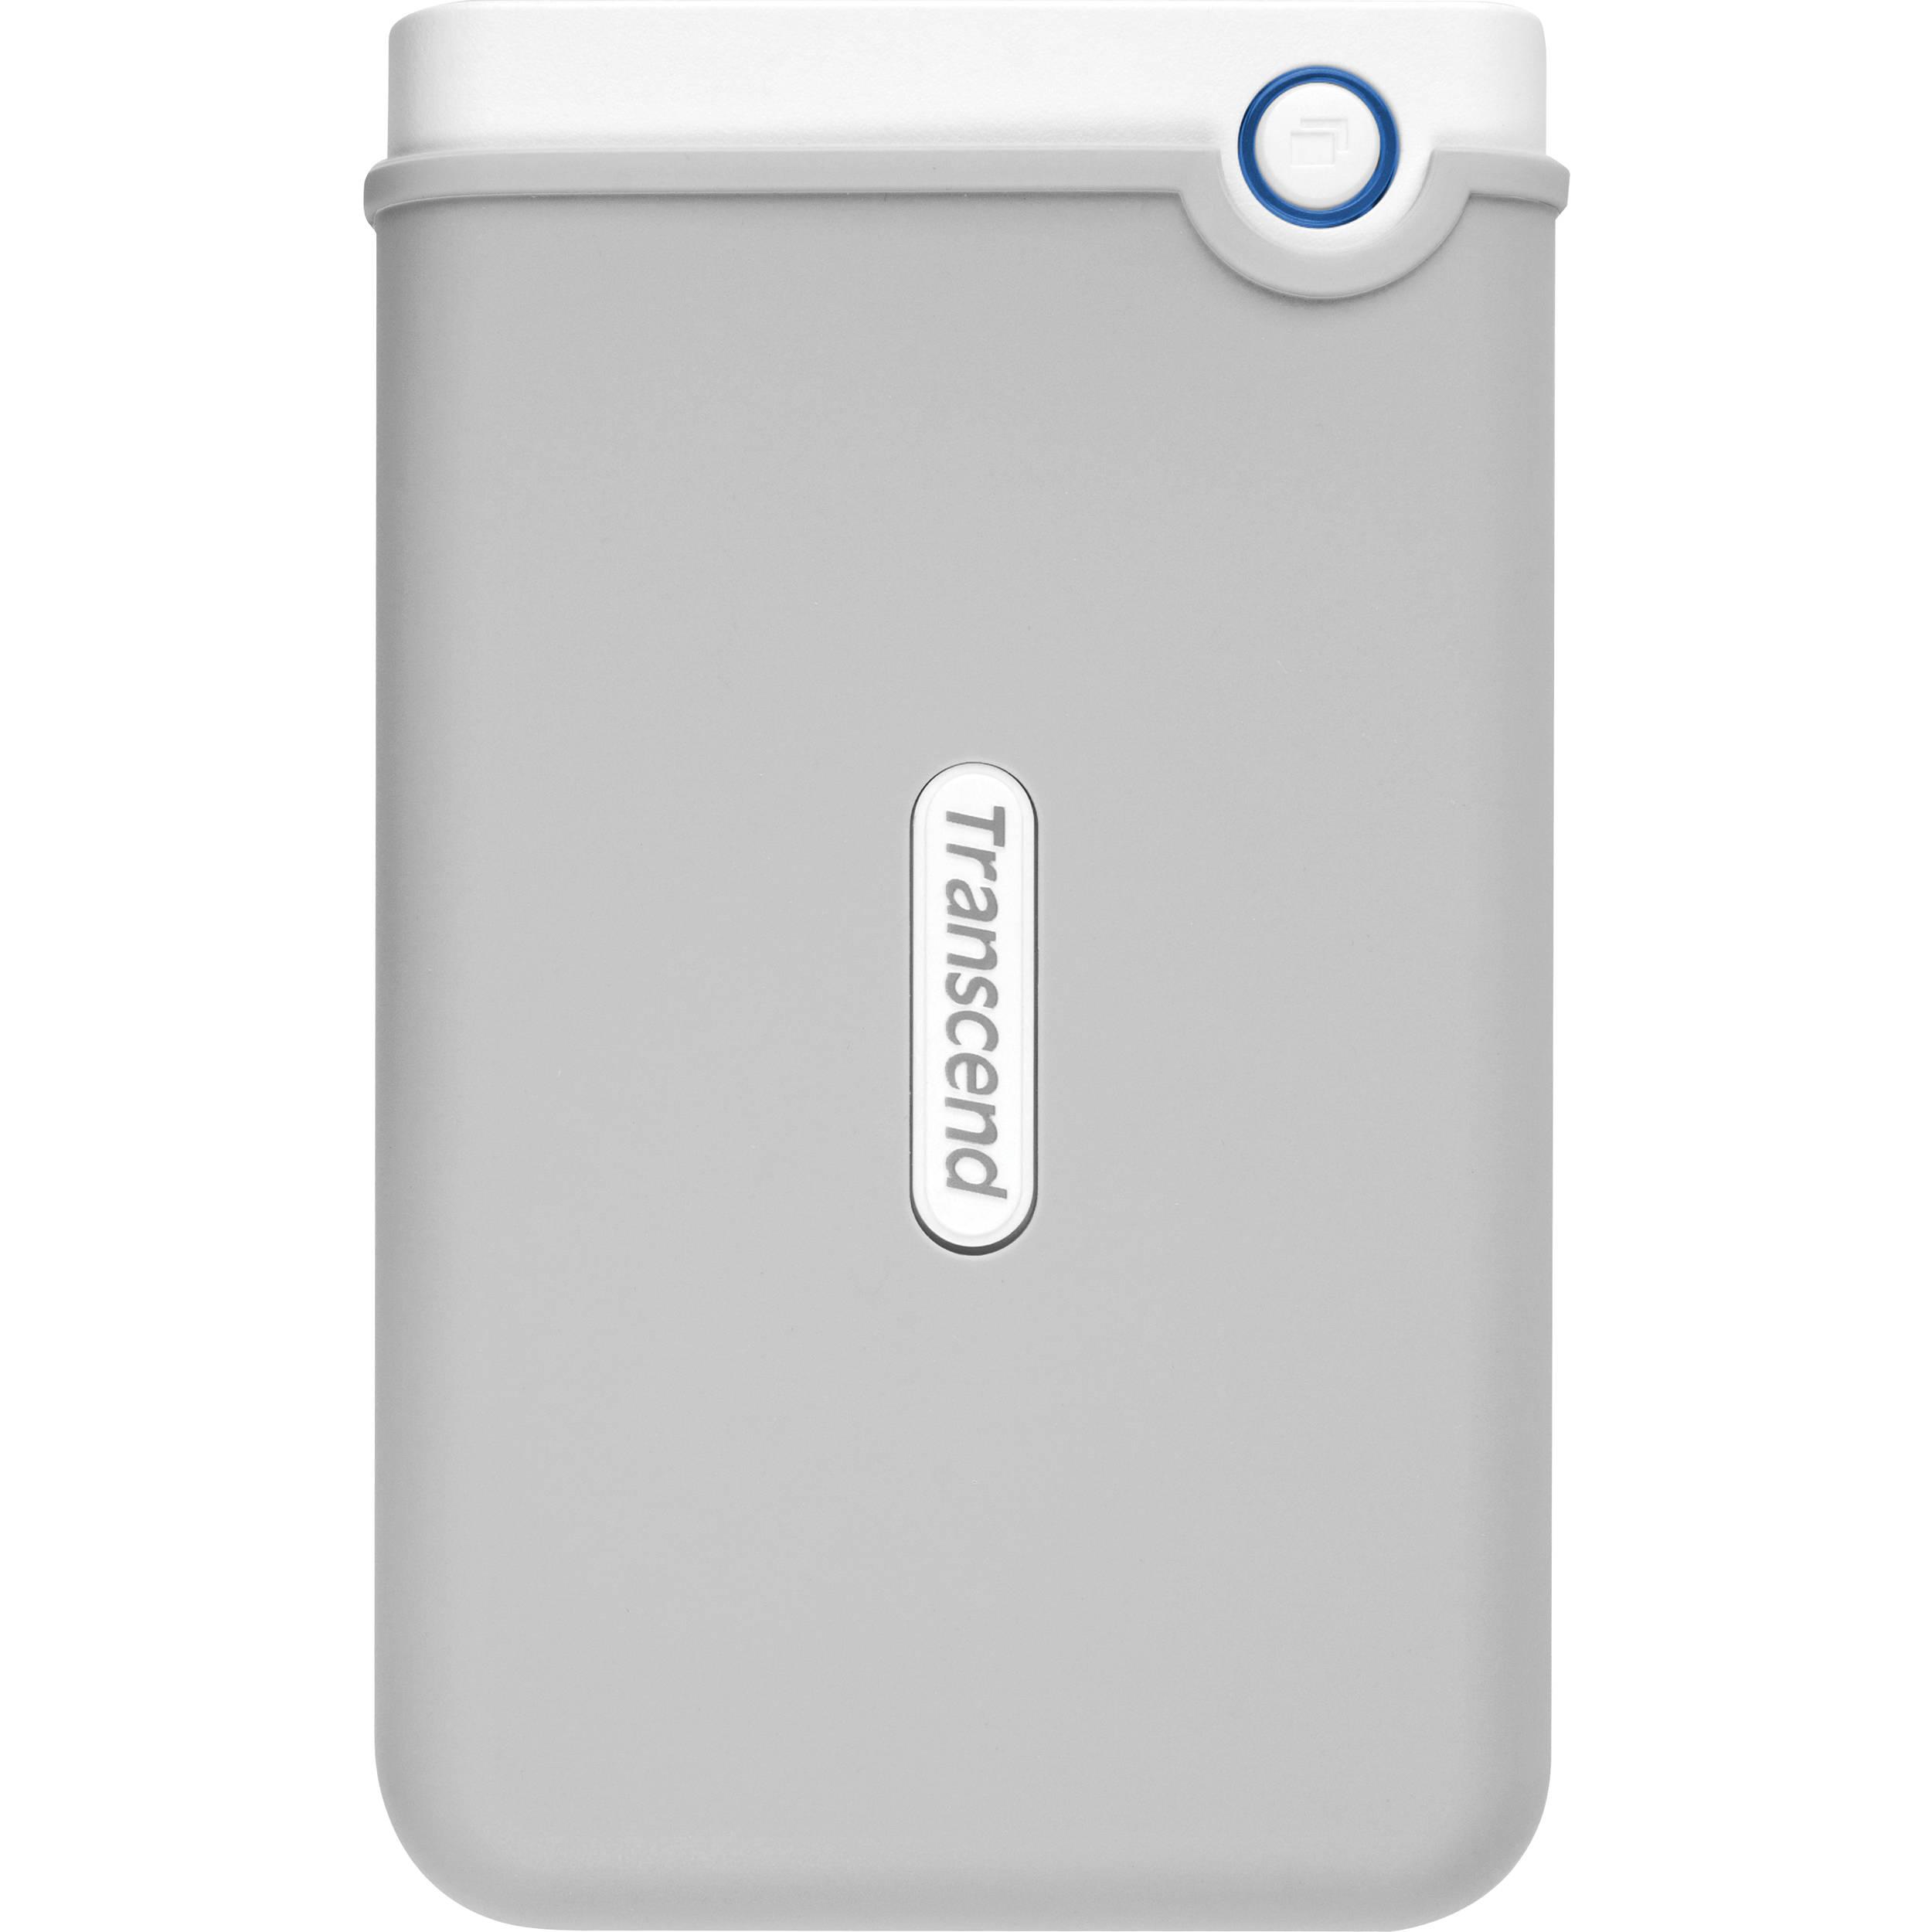 Transcend 2tb Storejet 100 Portable Hard Drive For Mac